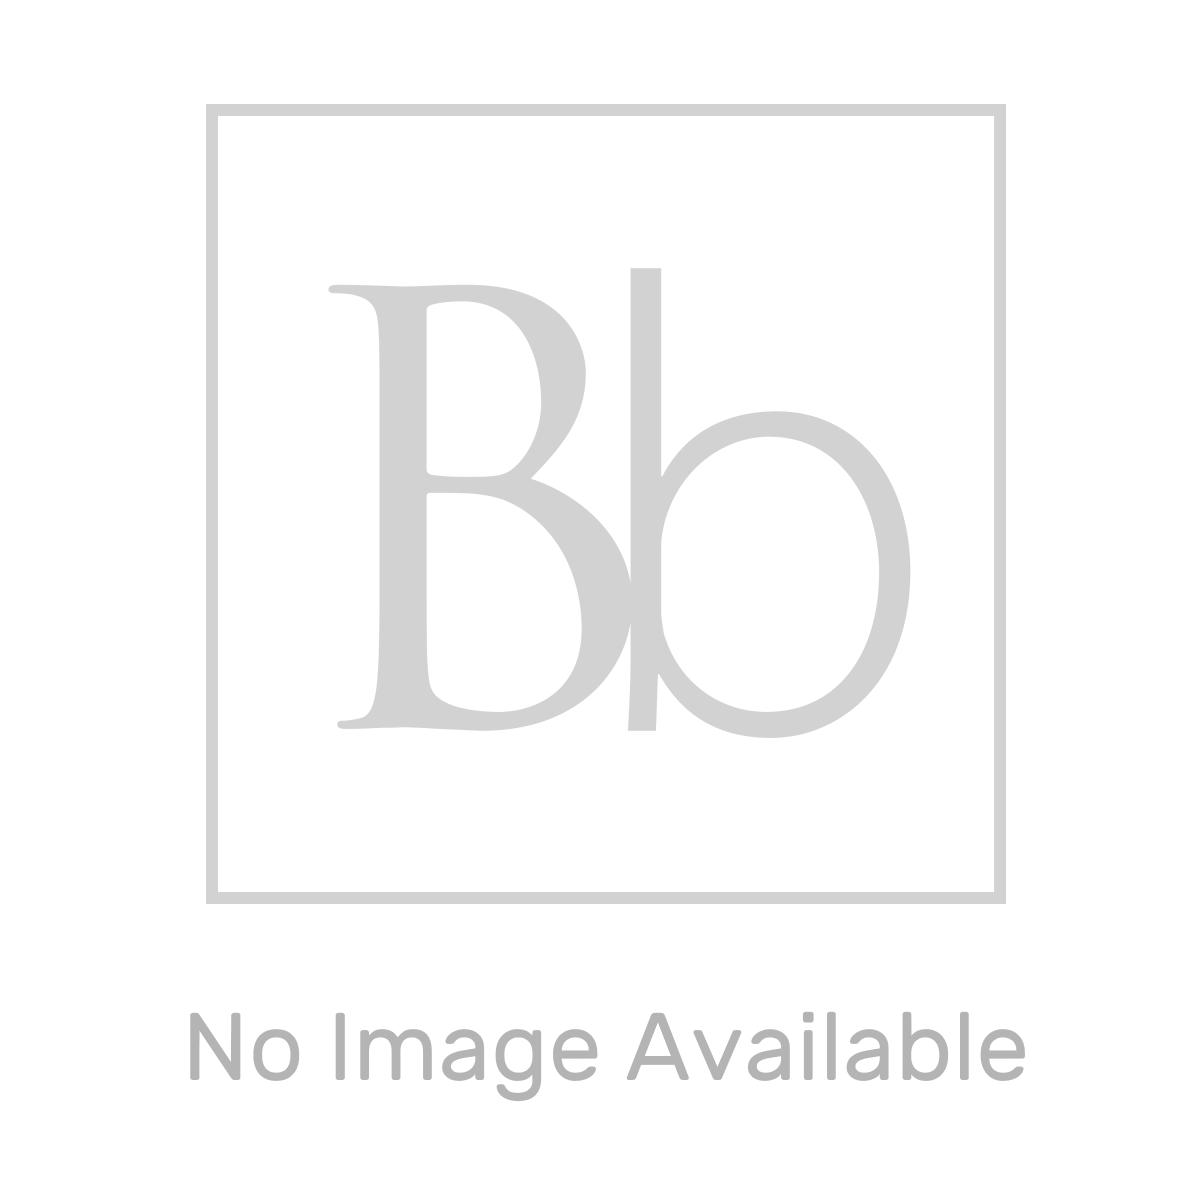 RAK Series 600 Close Coupled Toilet and 400 Series Gloss White Mini Vanity Unit